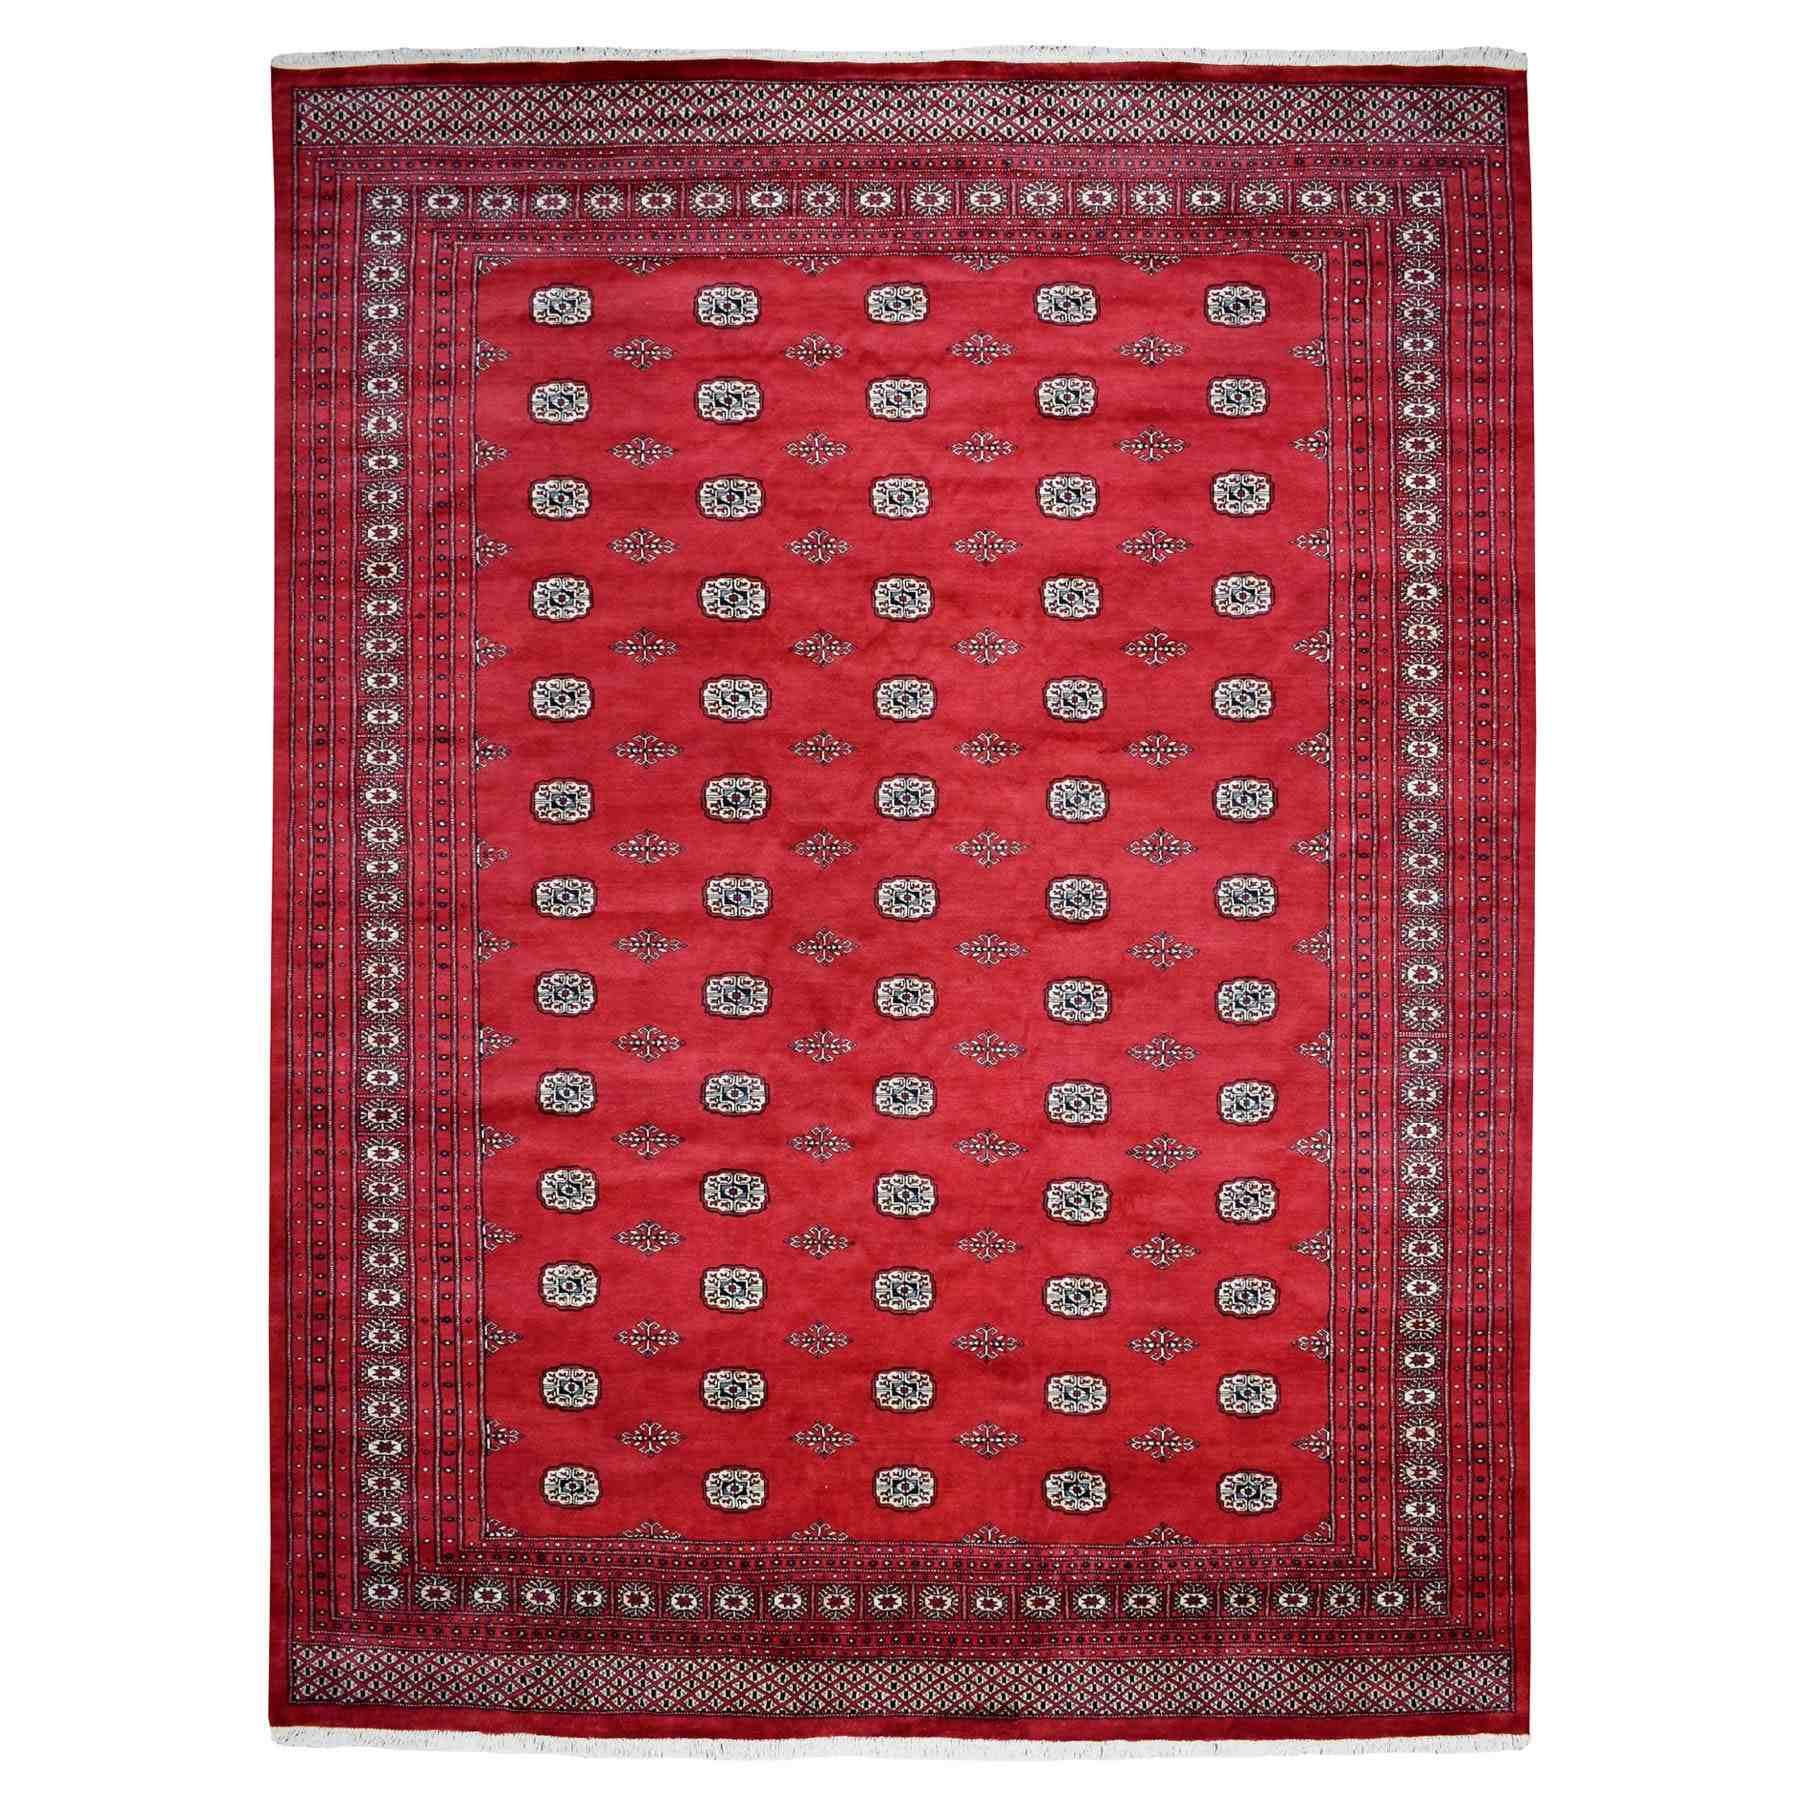 "10'3""X13'4"" Red Elephant Feet Design Mori Bokara Pure Wool Hand Knotted Oriental Rug moaee0cc"